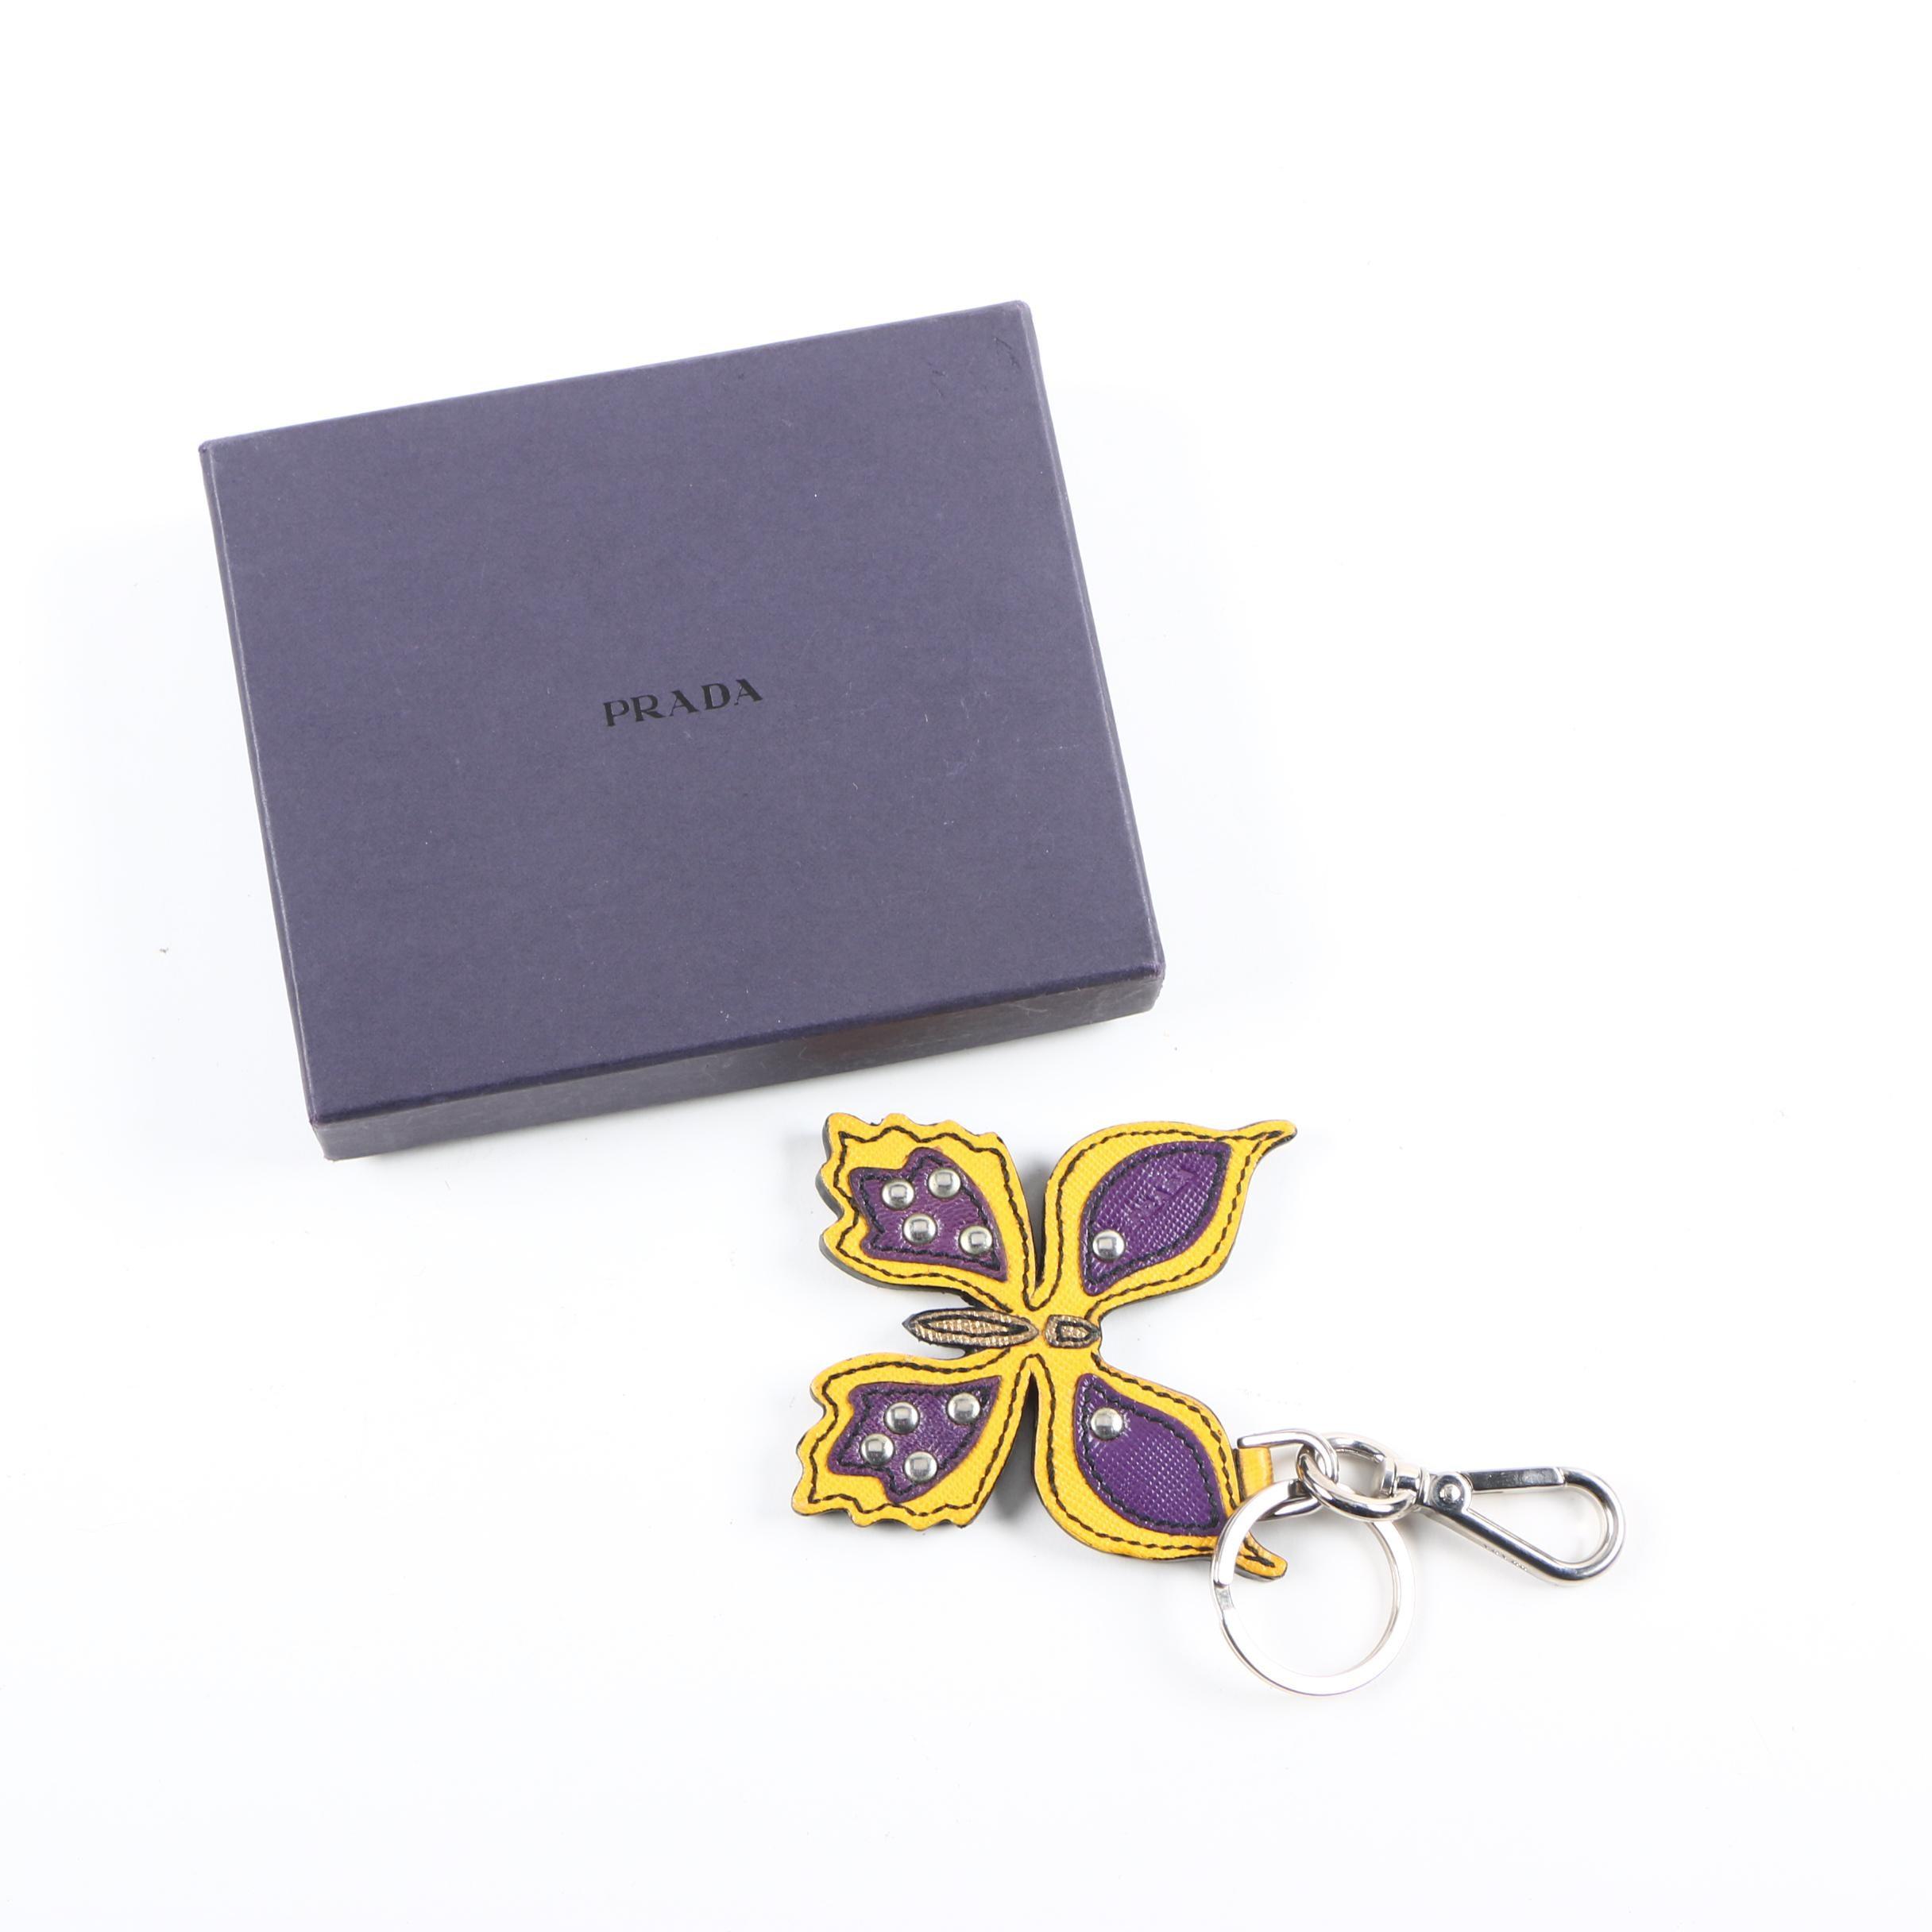 Prada Leather Butterfly Key Chain